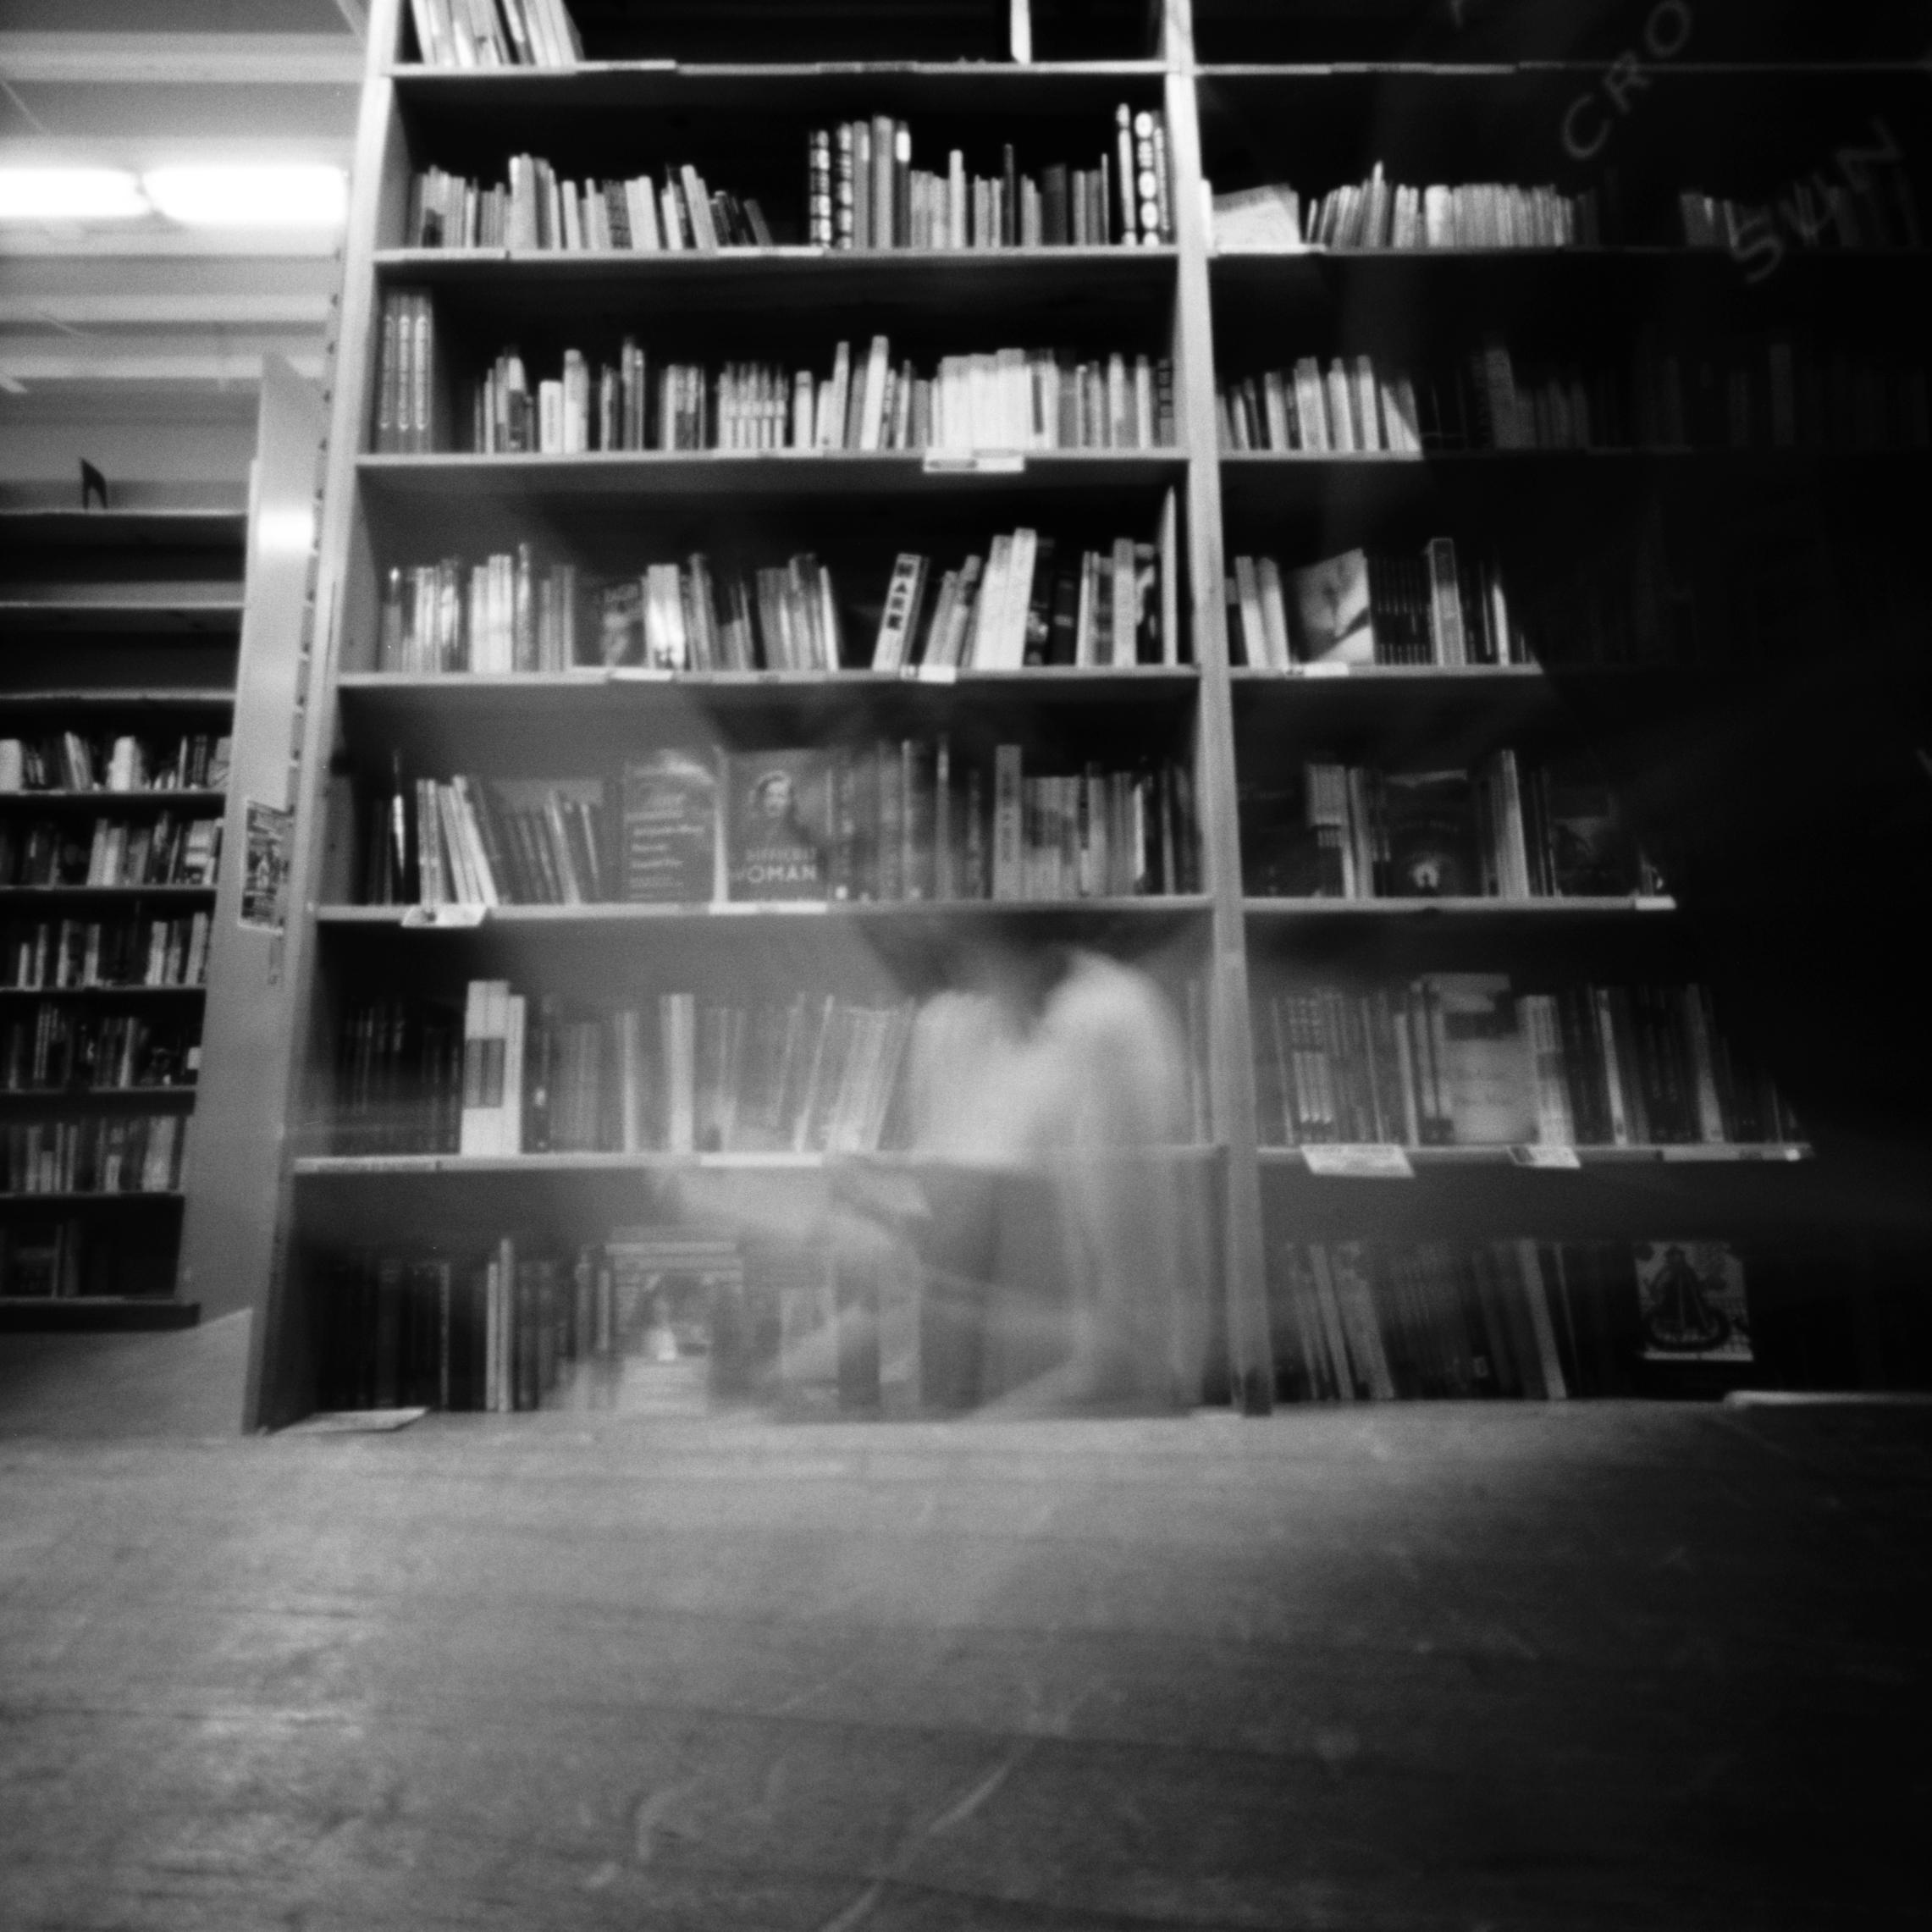 Powell's City of Books, December 2012